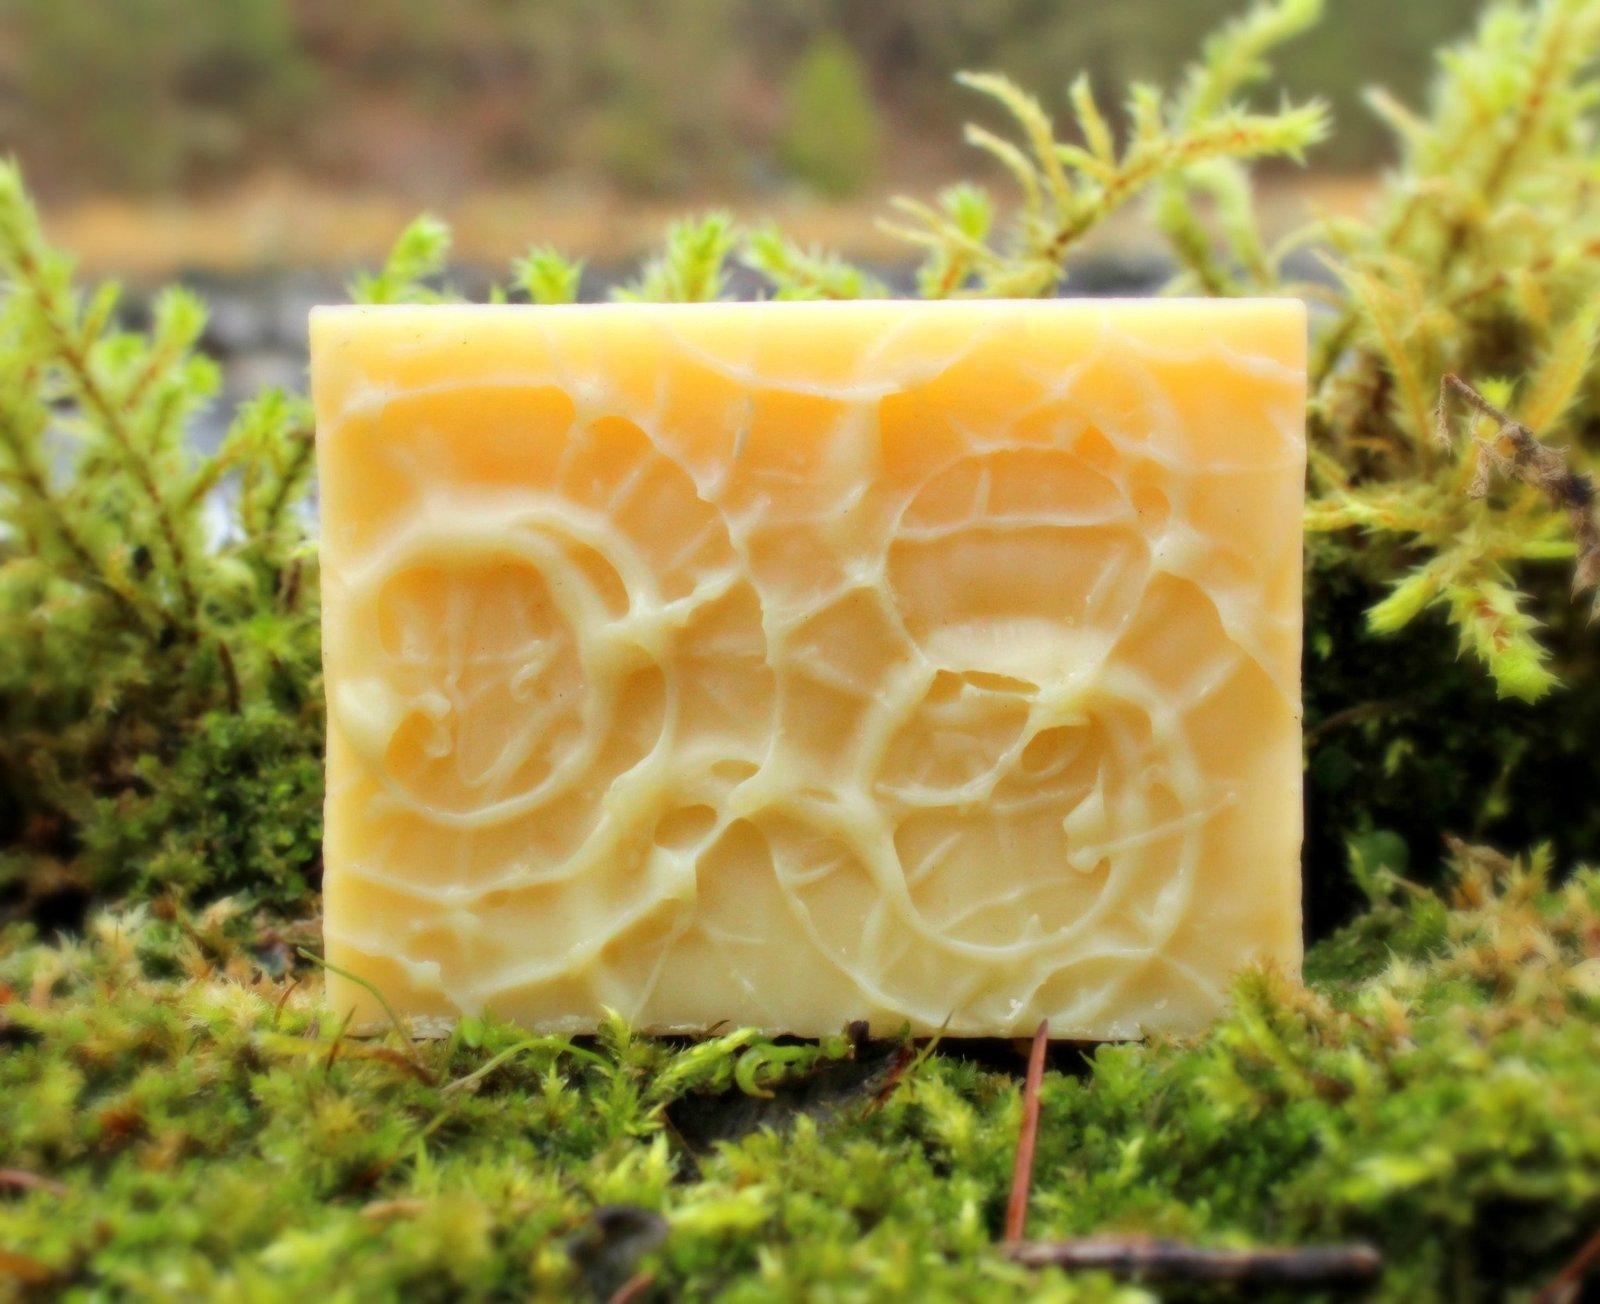 0670 rosemarypeppermint shampoo 2415x1968